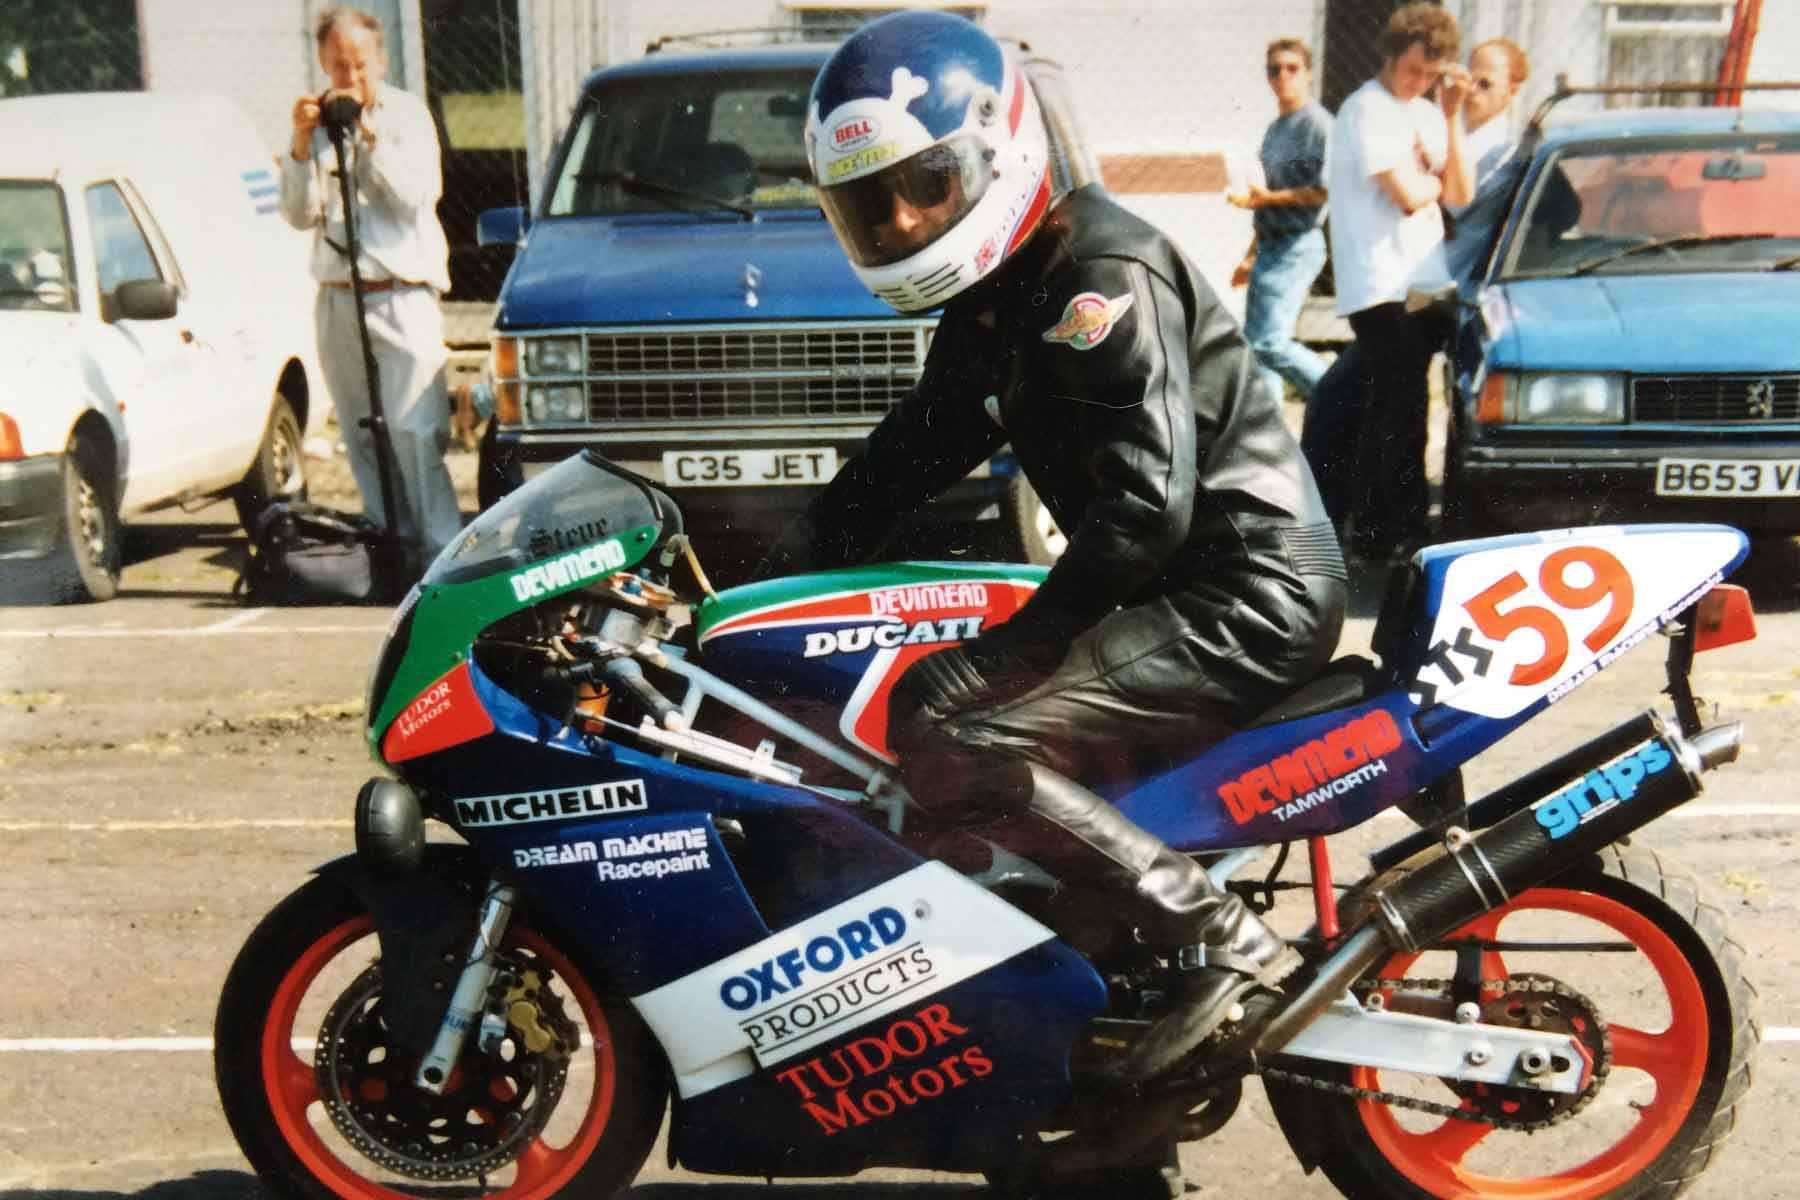 A Ducati 888.